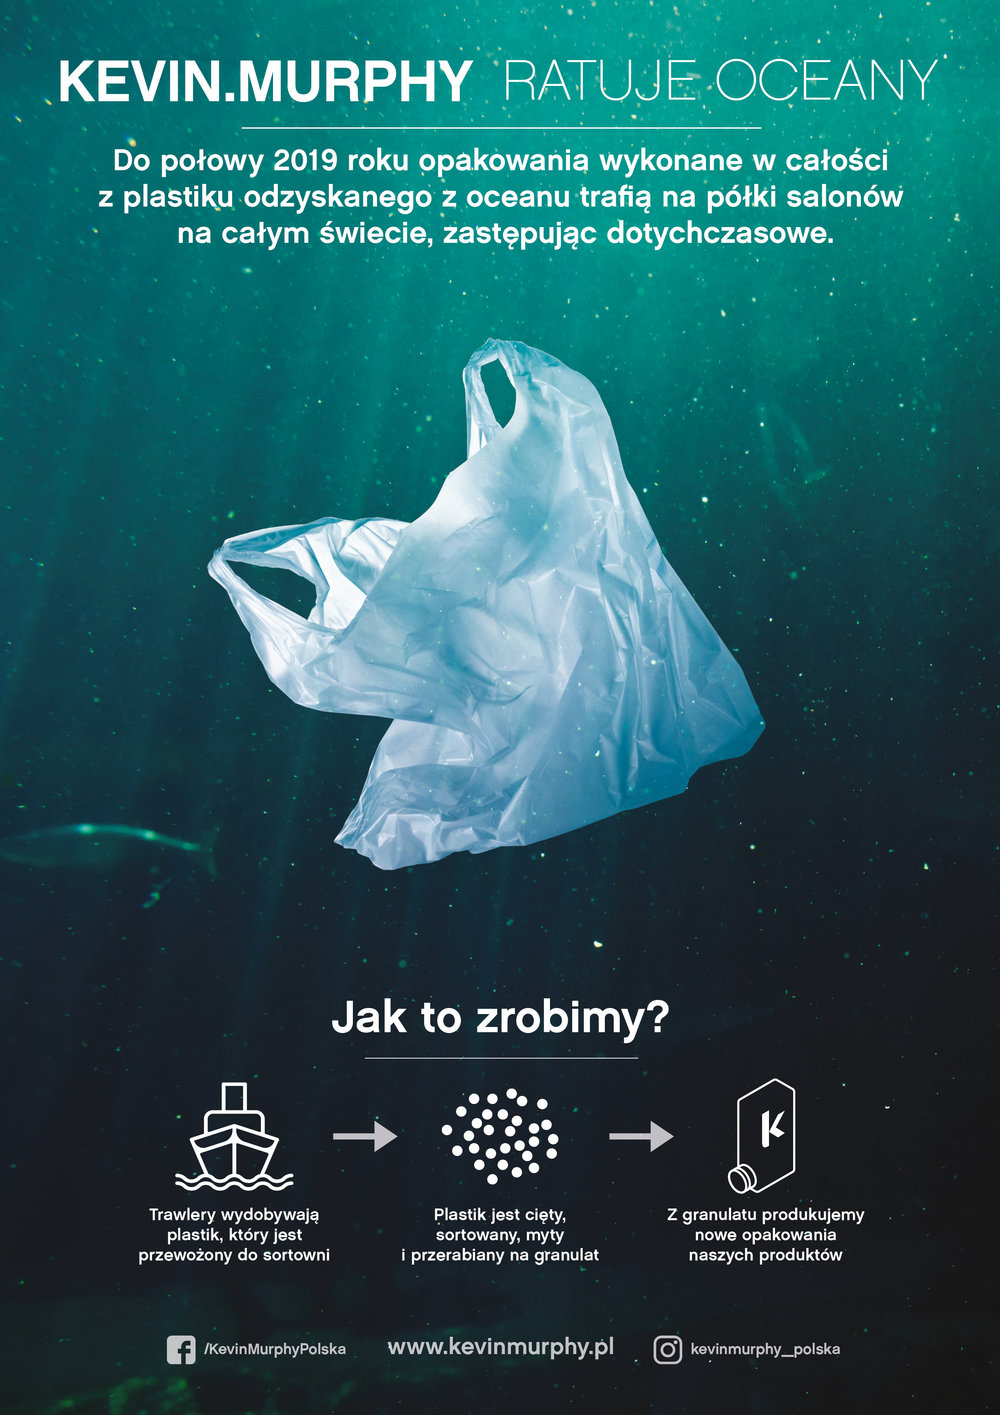 Ocean Waste Plastic_1_300dpi.jpg